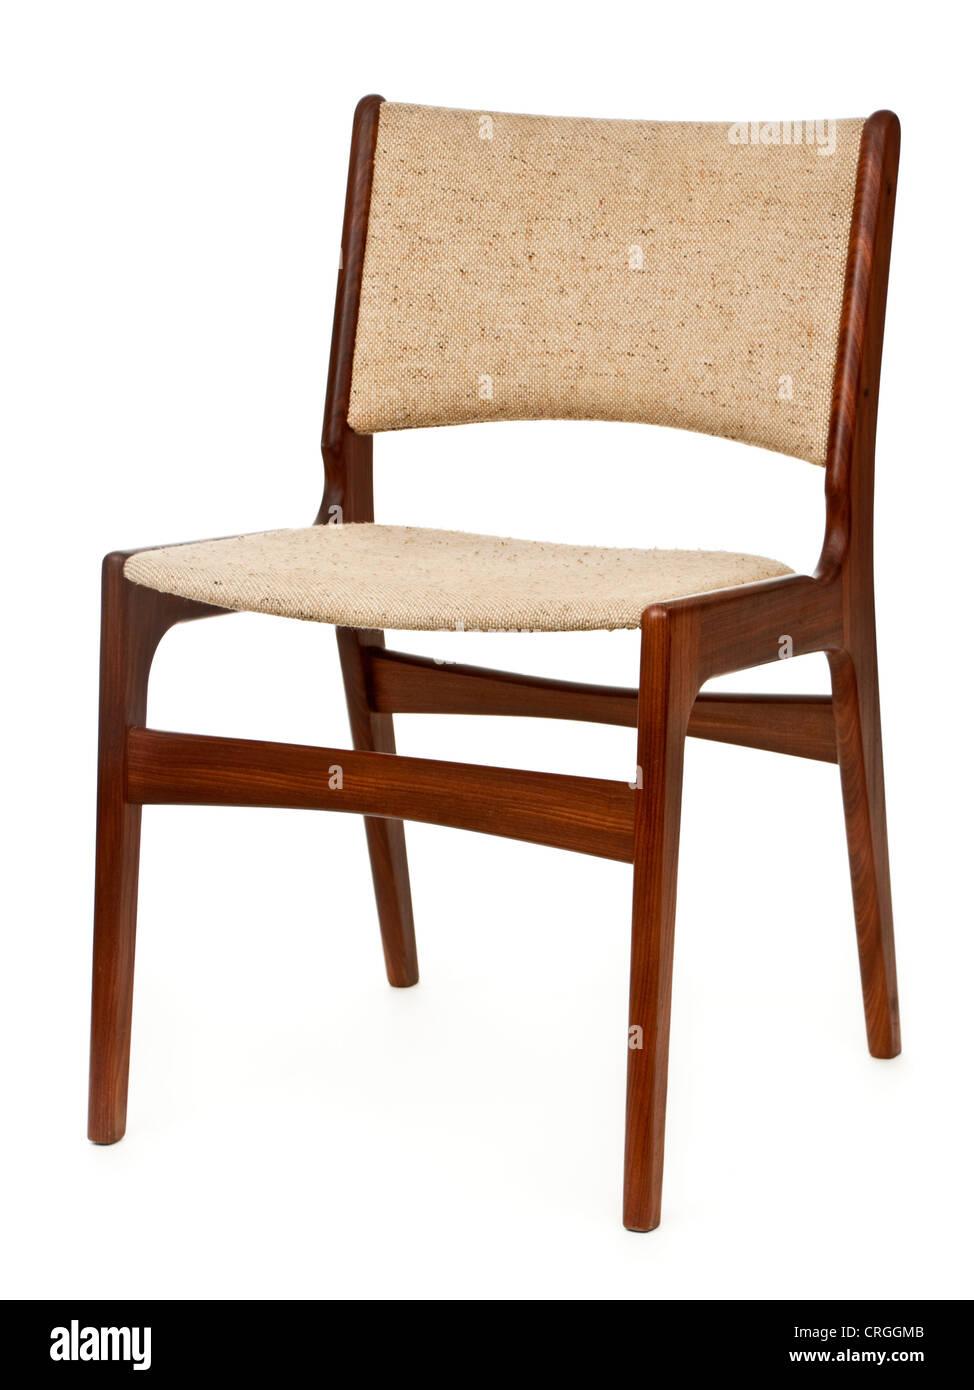 Vintage Danish modernist solid teak dining chair - Vintage Danish Modernist Solid Teak Dining Chair Stock Photo